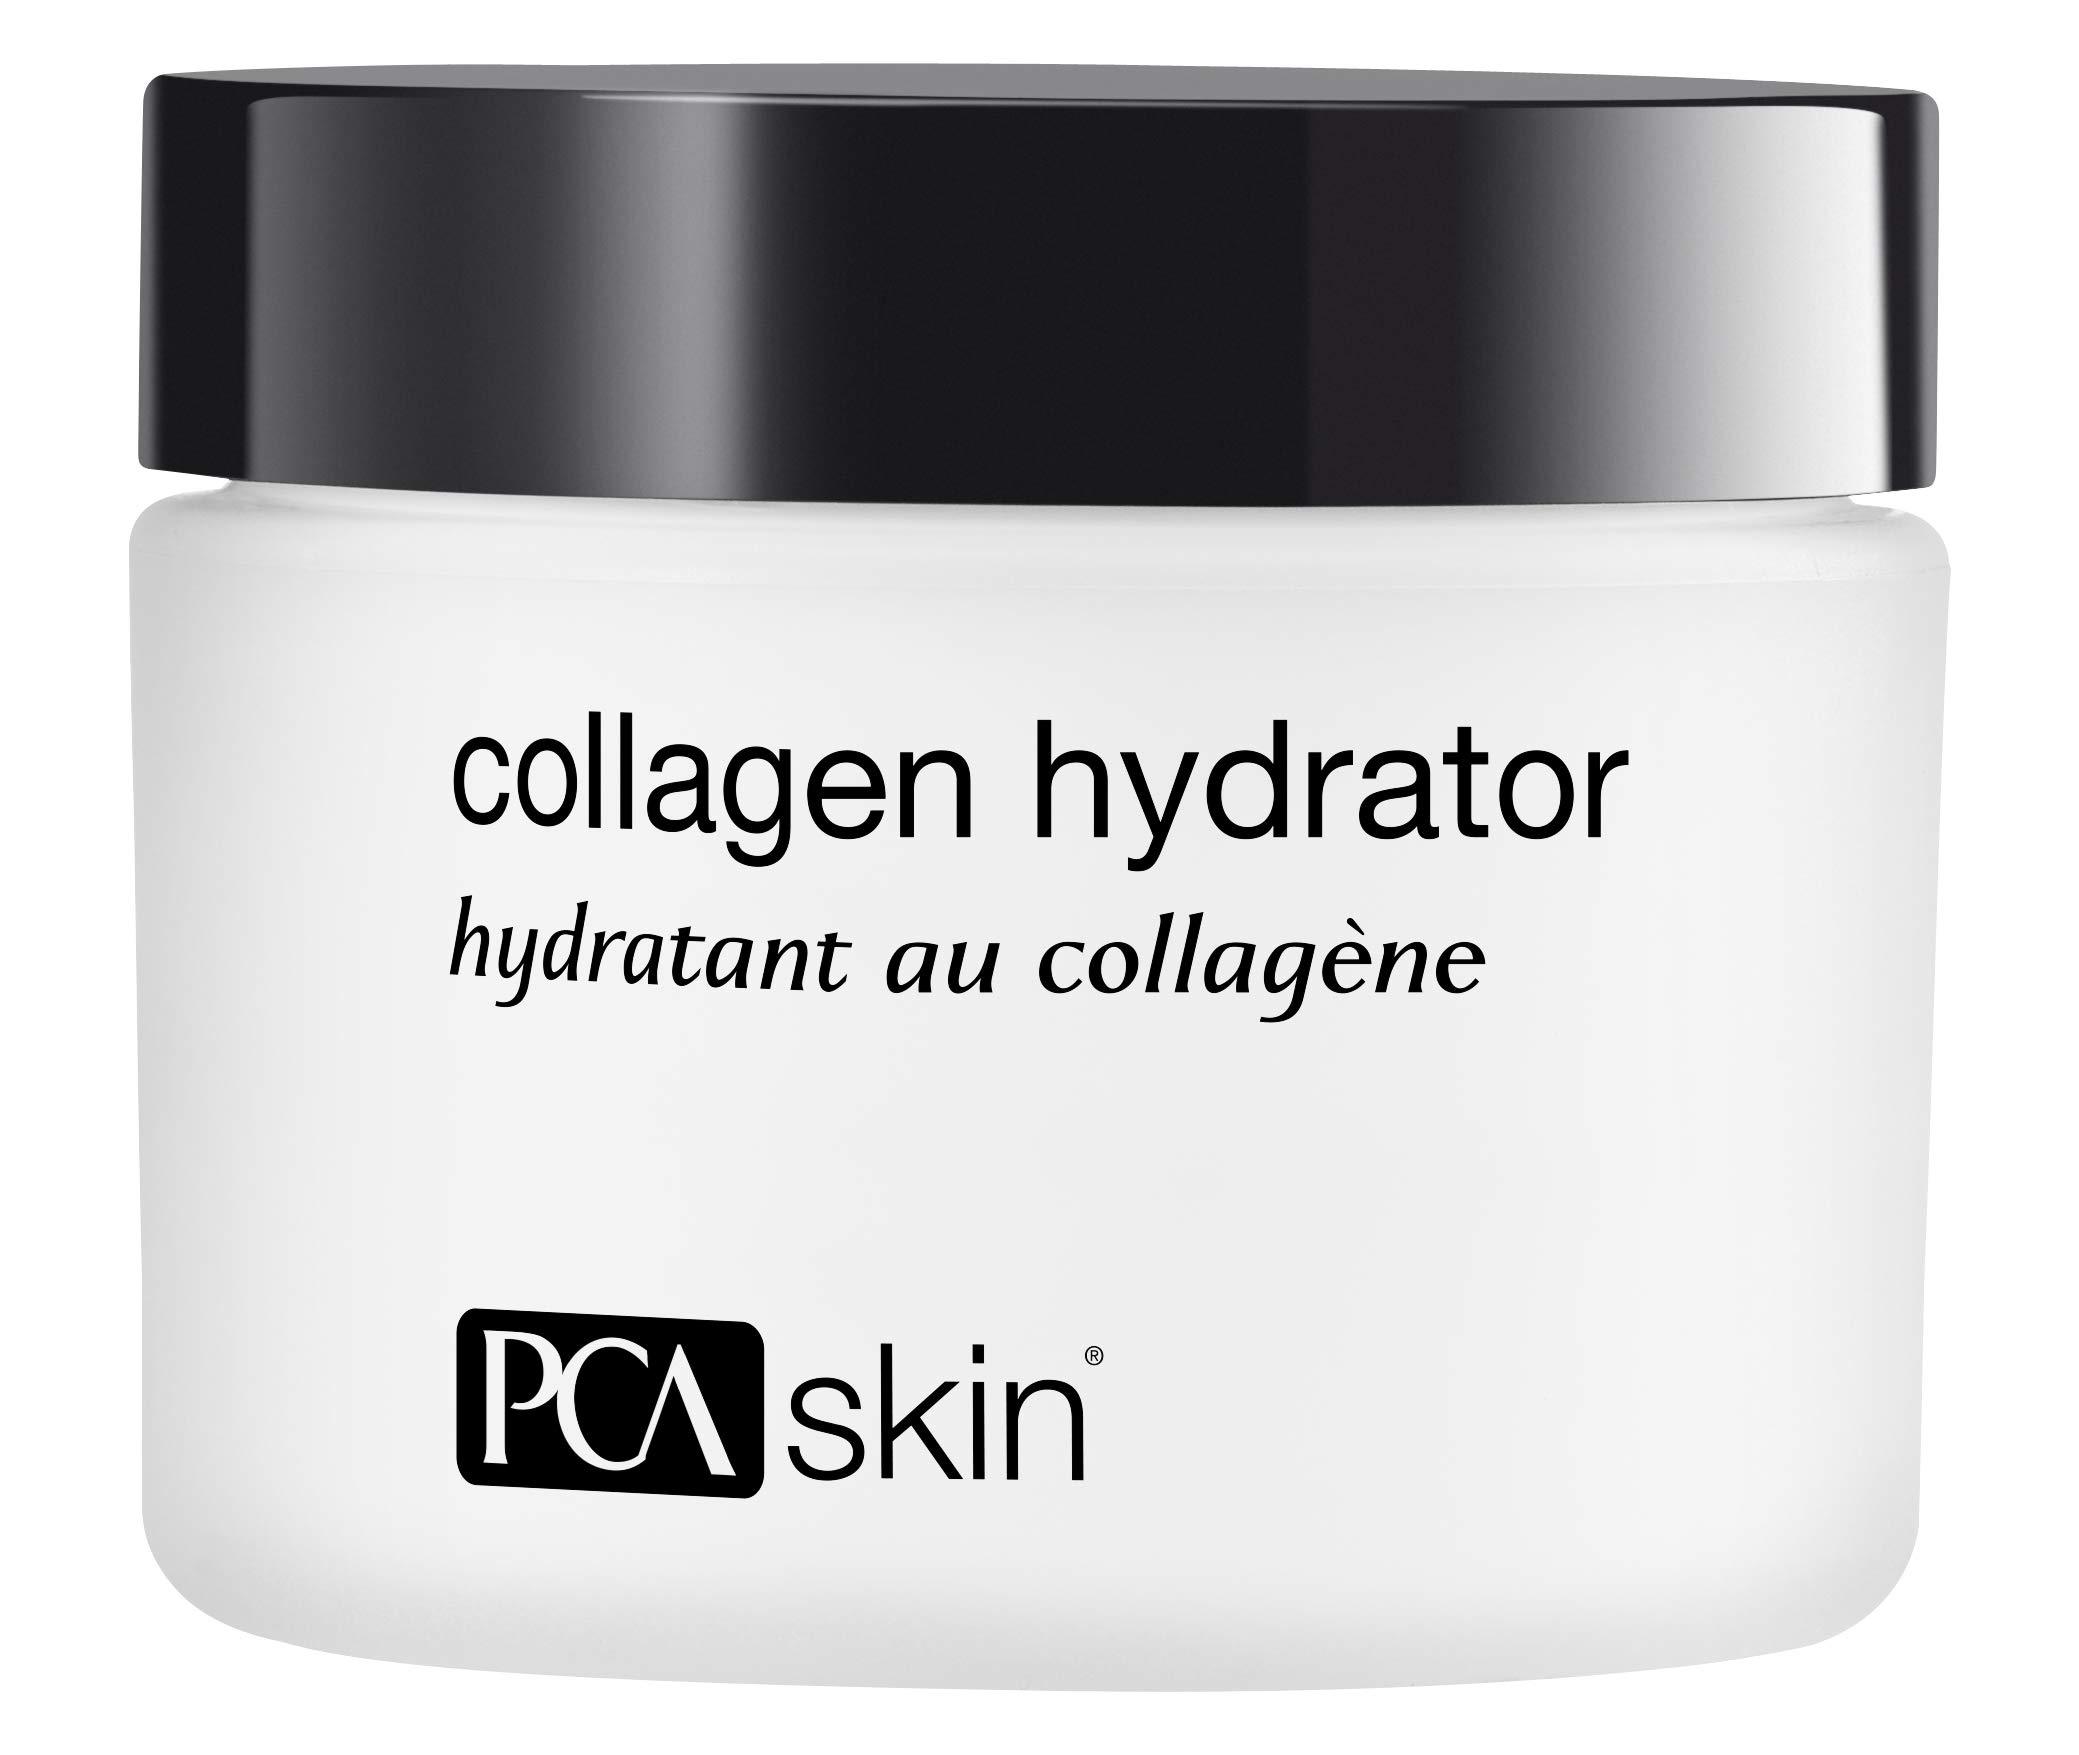 PCA SKIN Collagen Hydrator, Antioxidant Facial Cream, 1.7 ounce by PCA SKIN